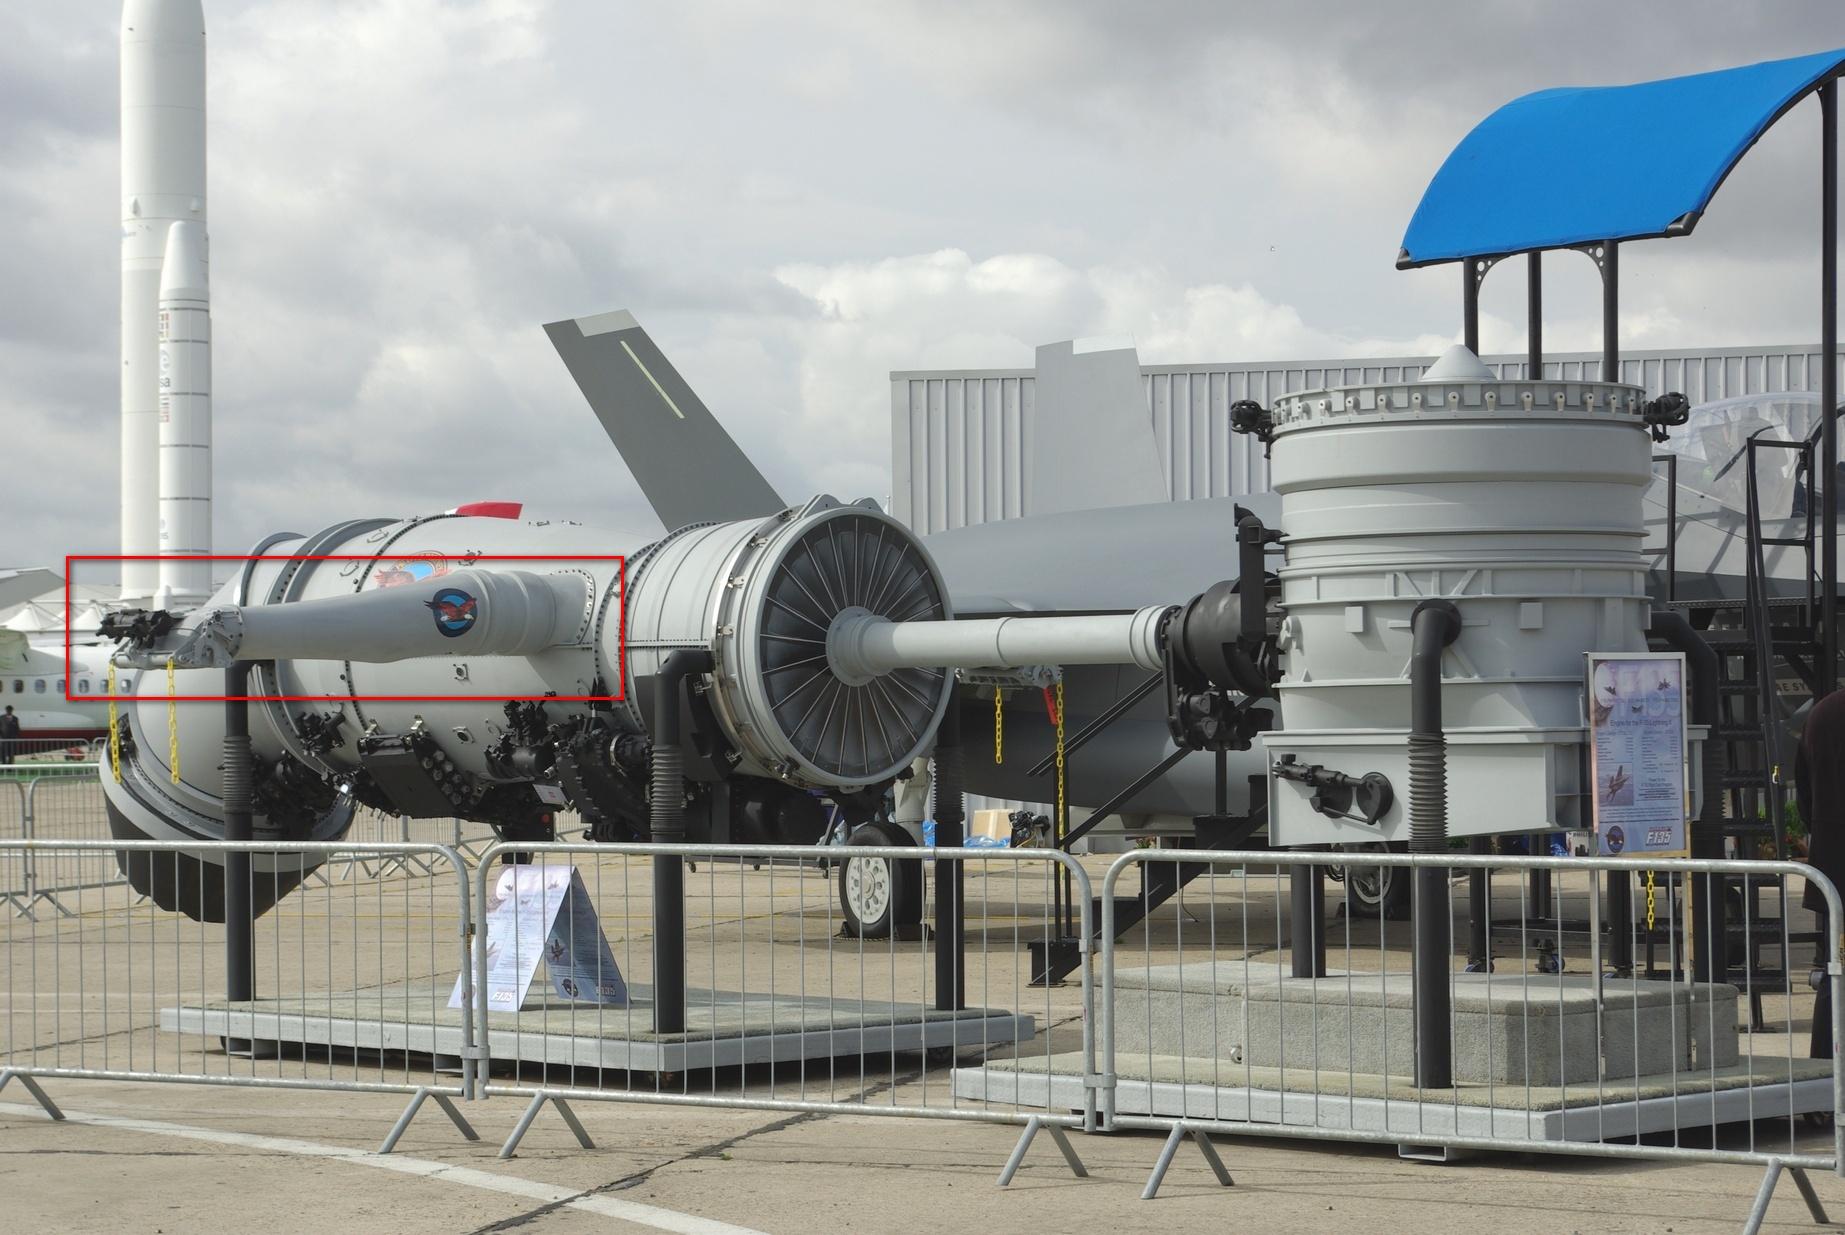 Engine_of_F-35.jpg